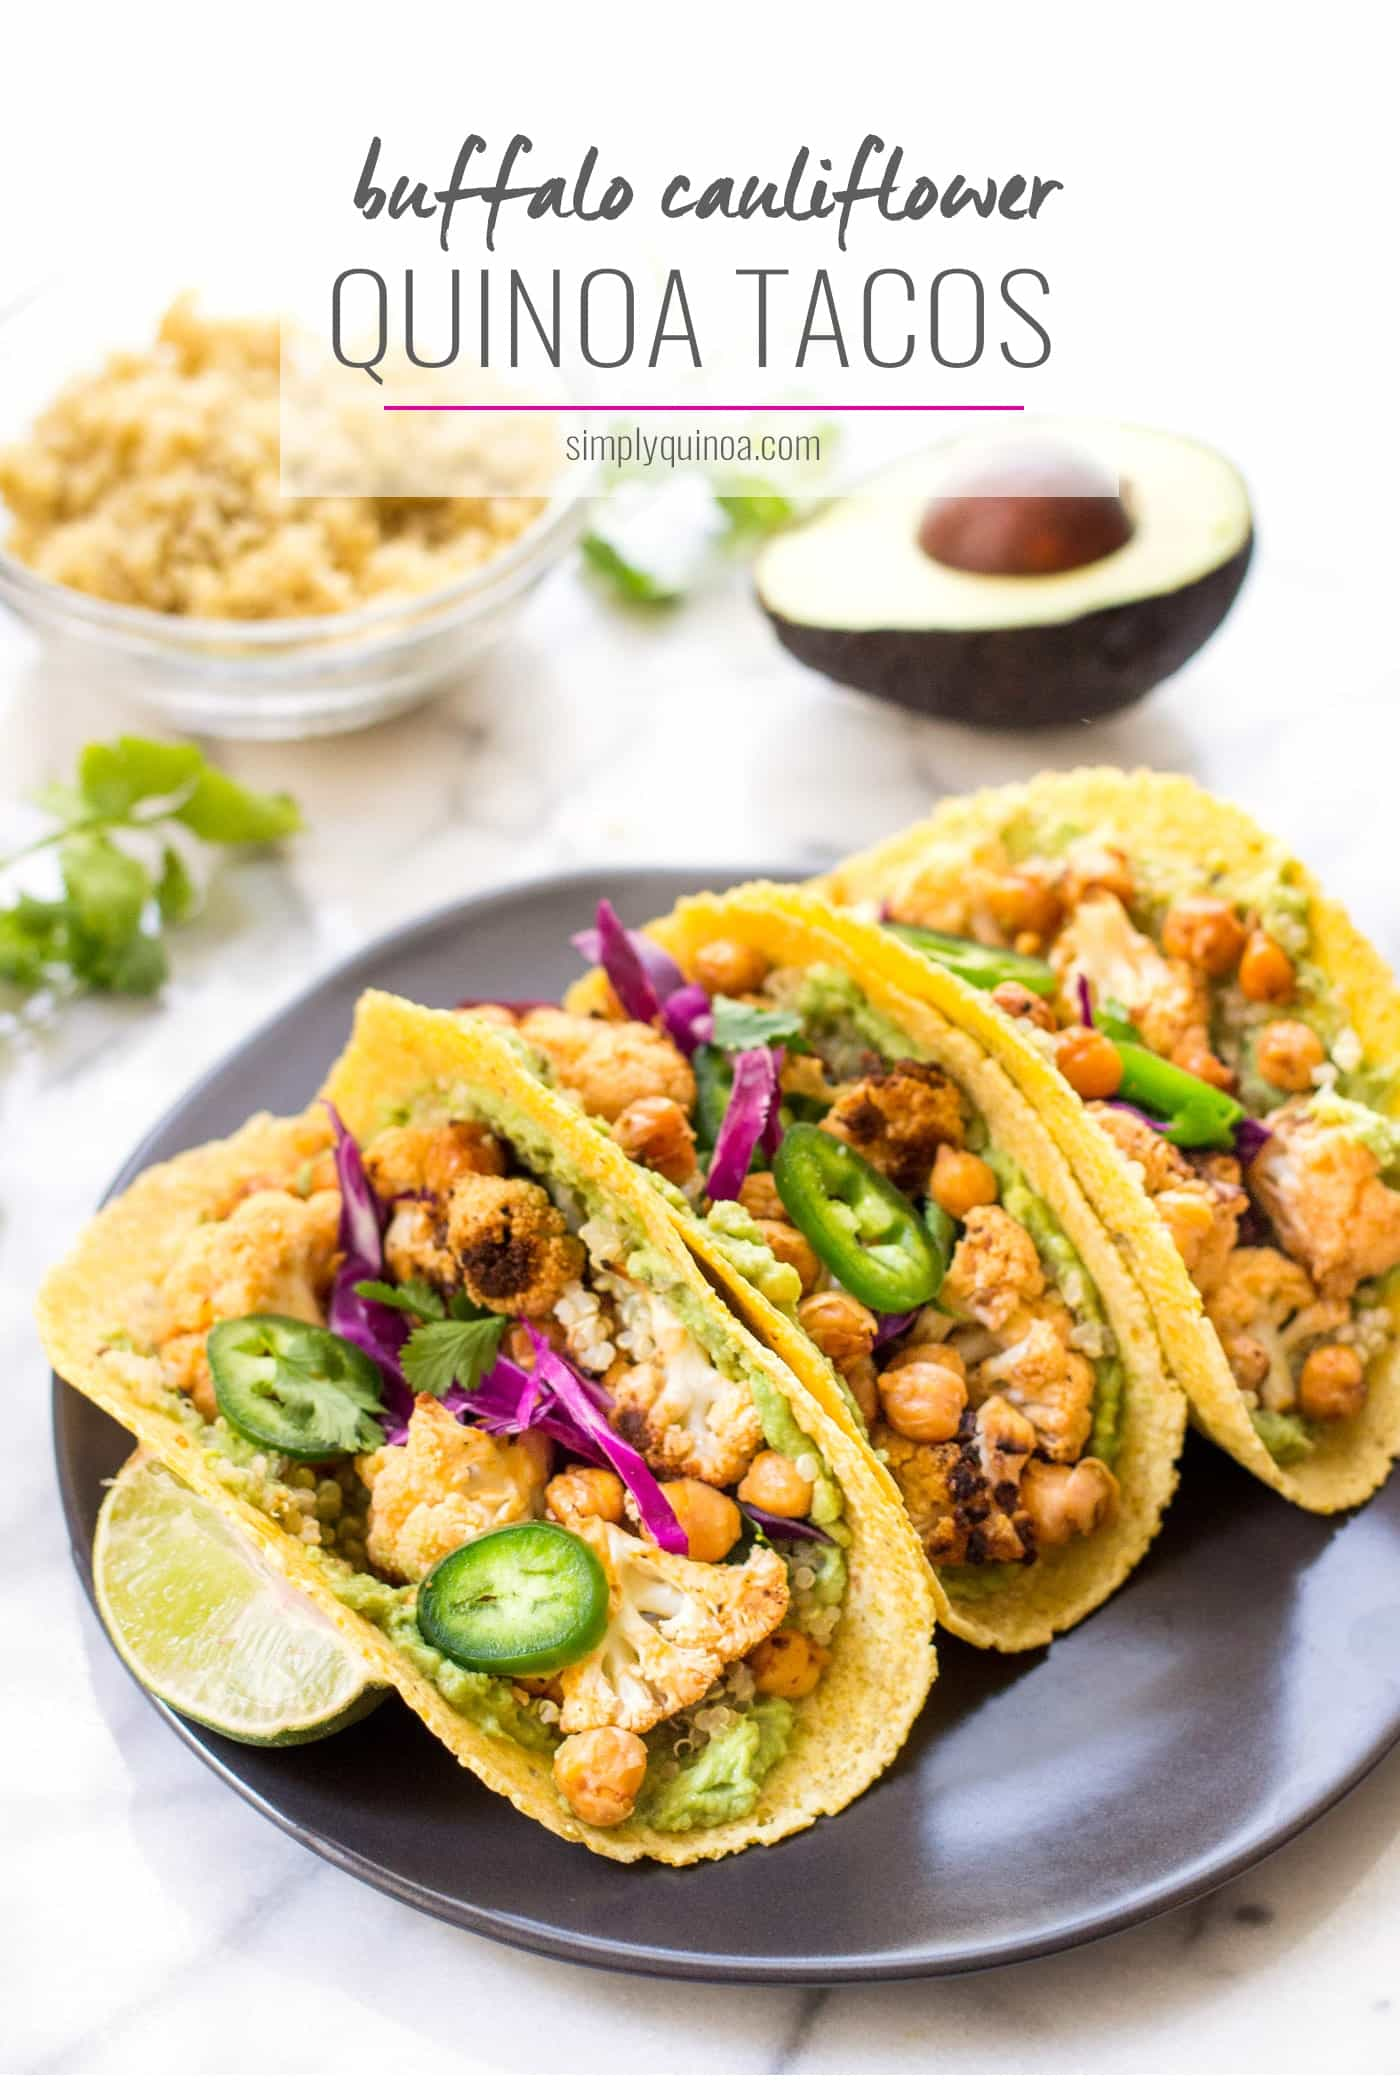 Buffalo Cauliflower & Quinoa Tacos -- quick, easy, healthy and SO FLAVORFUL! [vegan + gluten-free]